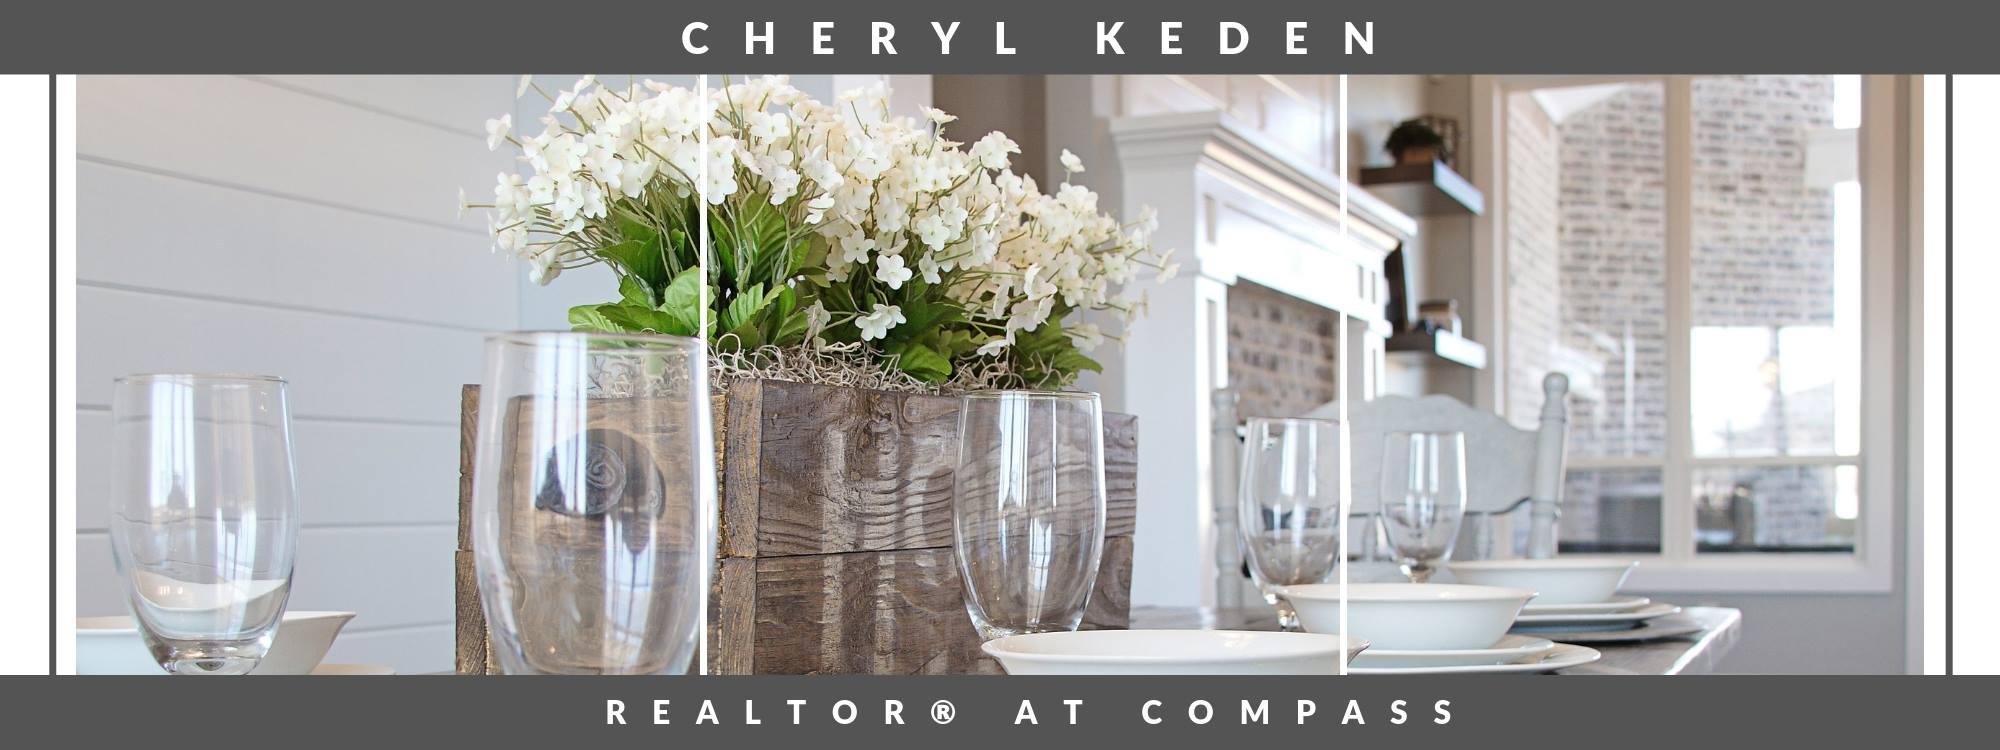 Cheryl Keden Real Estate Danville CA